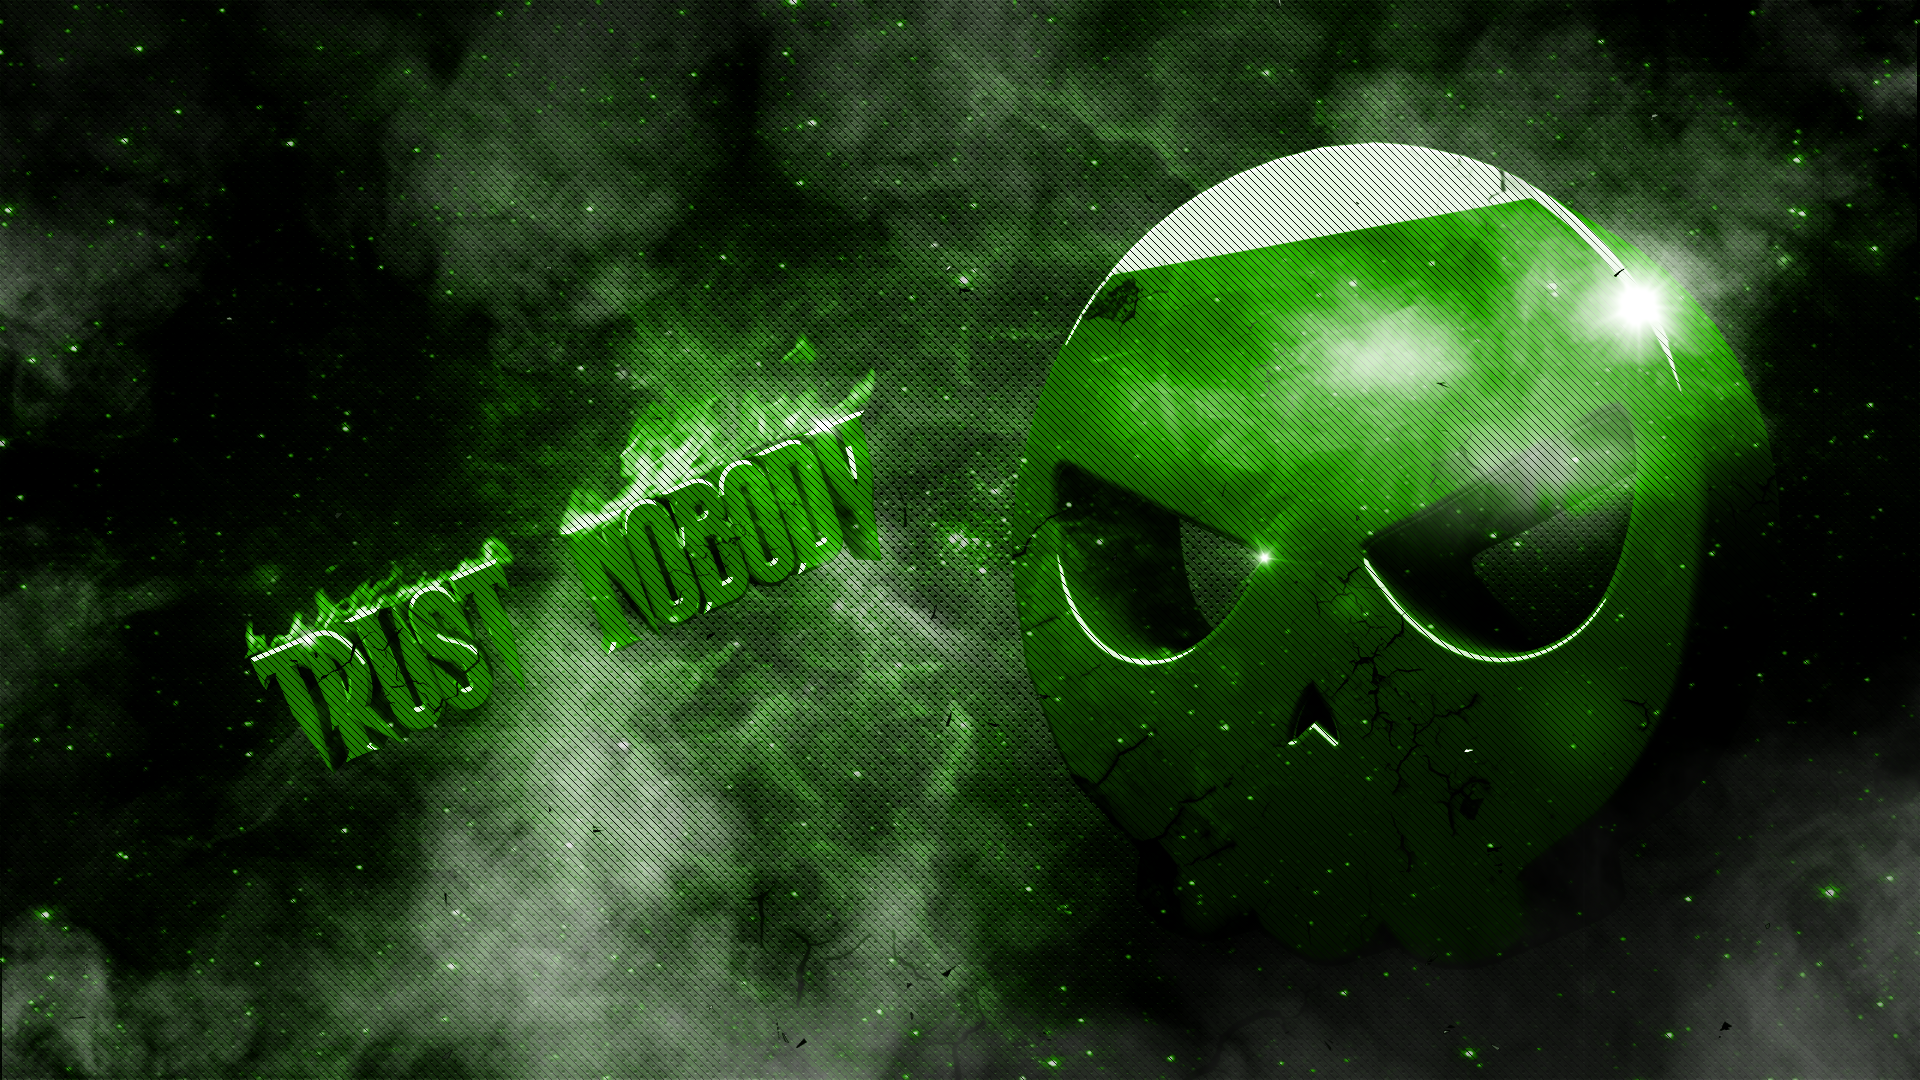 Cool Green Skull Wallpapers Enemy skull wallpaper 1 by 1920x1080